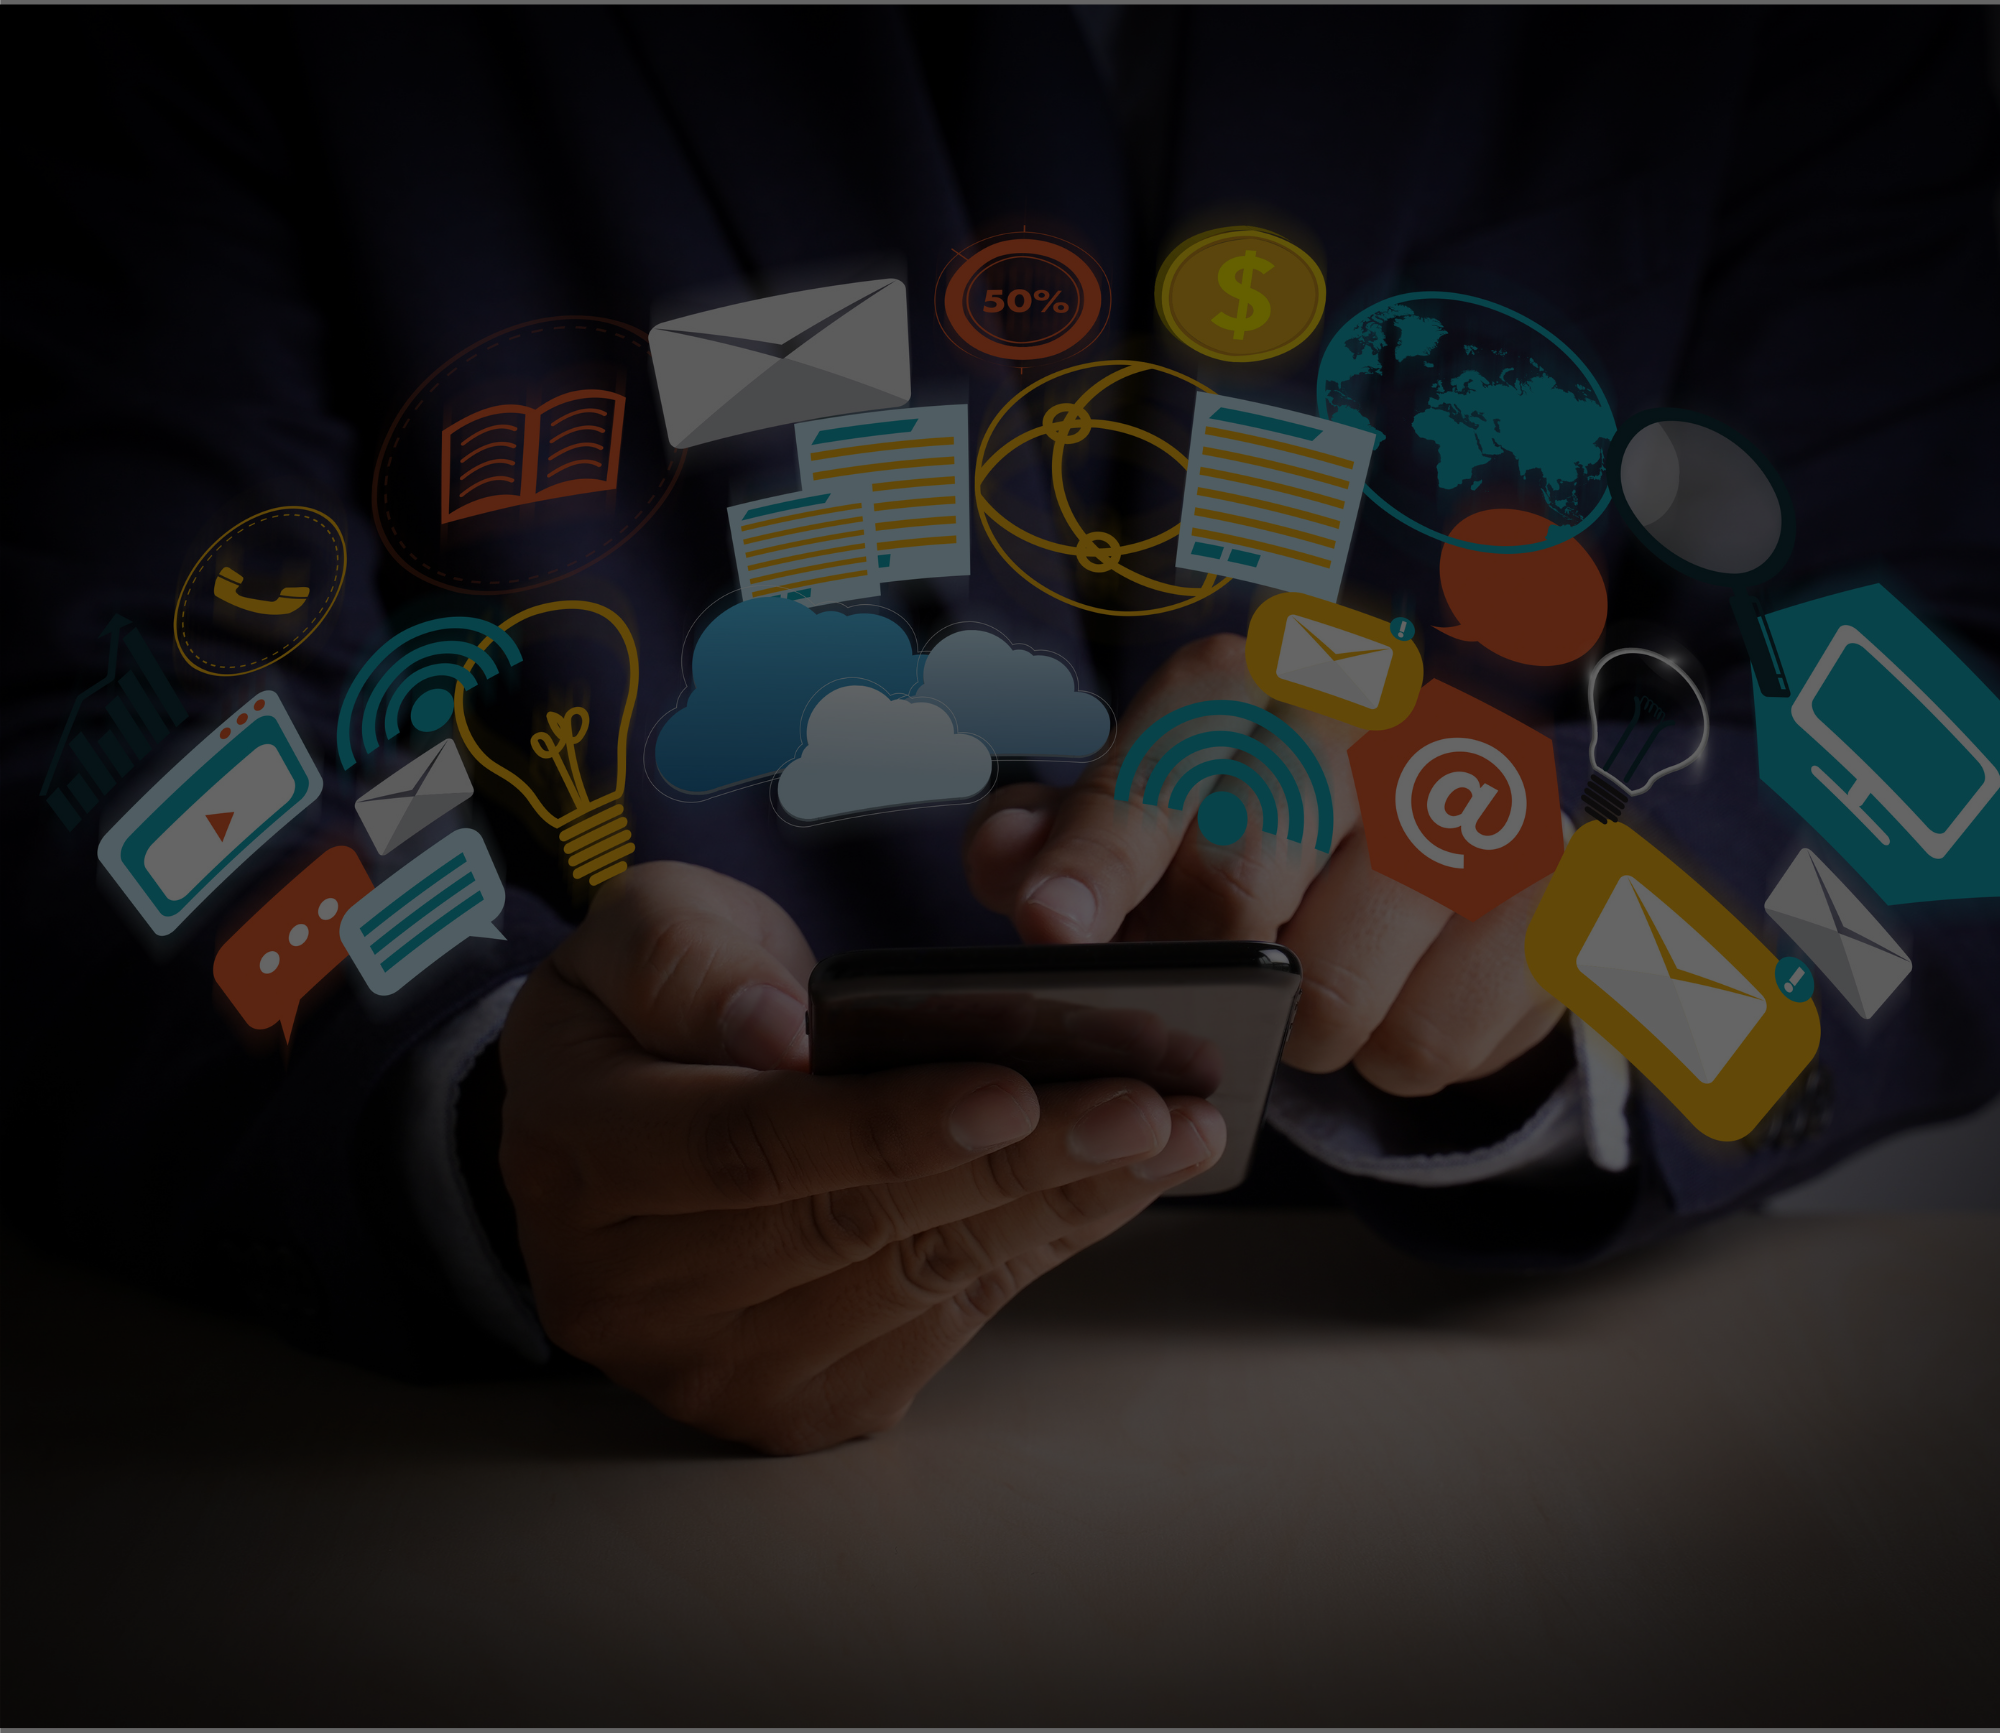 10 Digital Marketing Acronyms You Need to Know